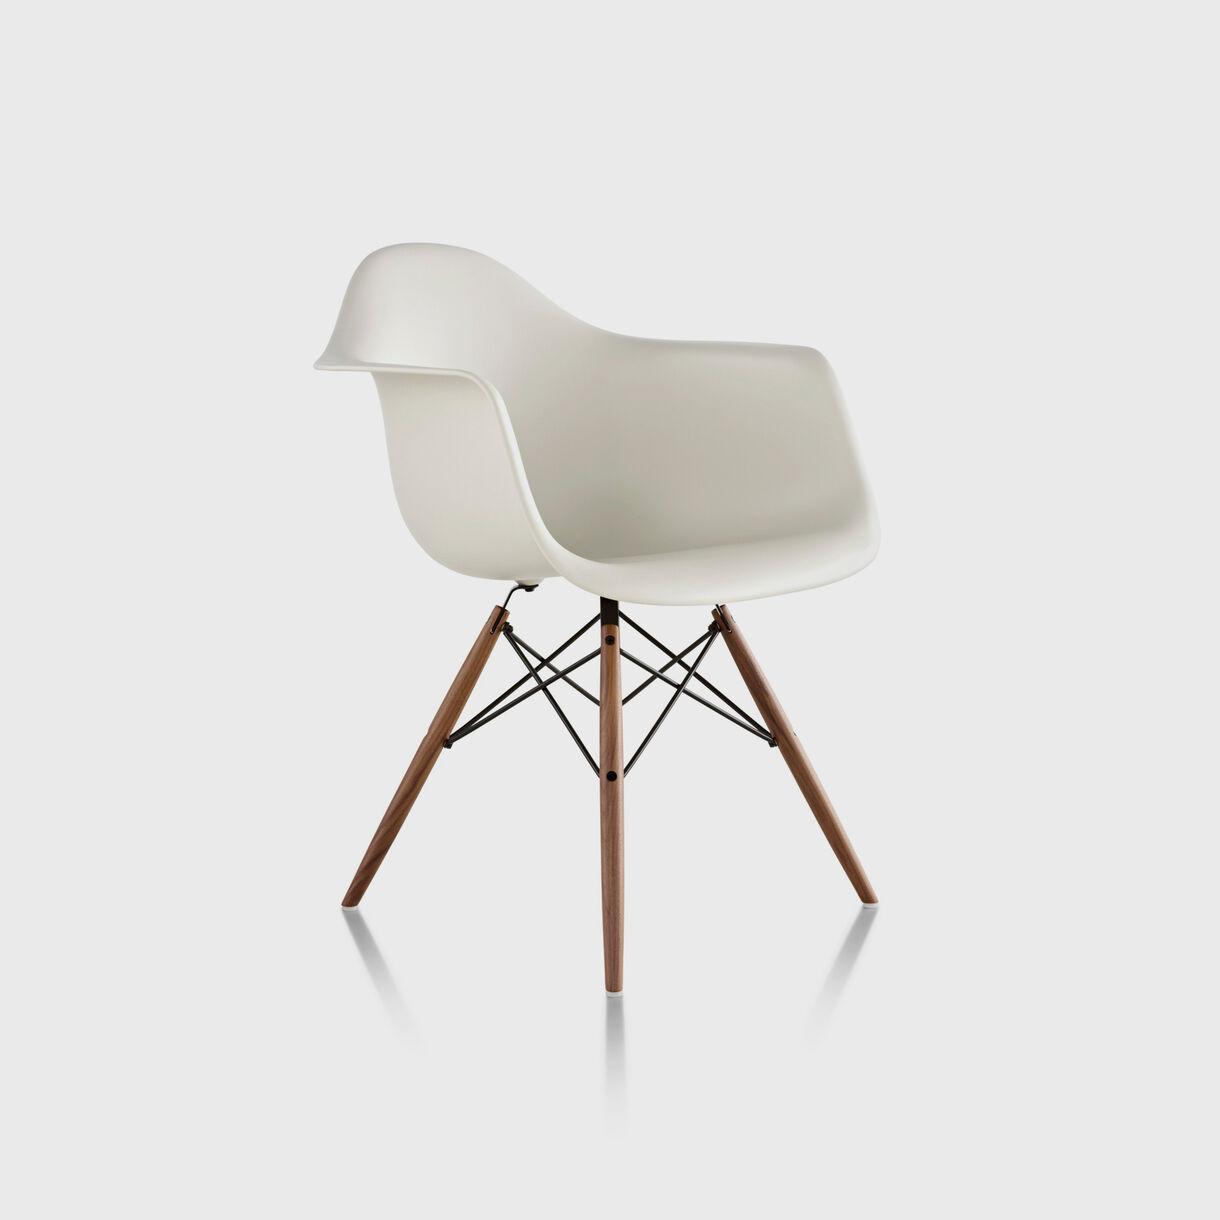 Eames Moulded Plastic Armchair